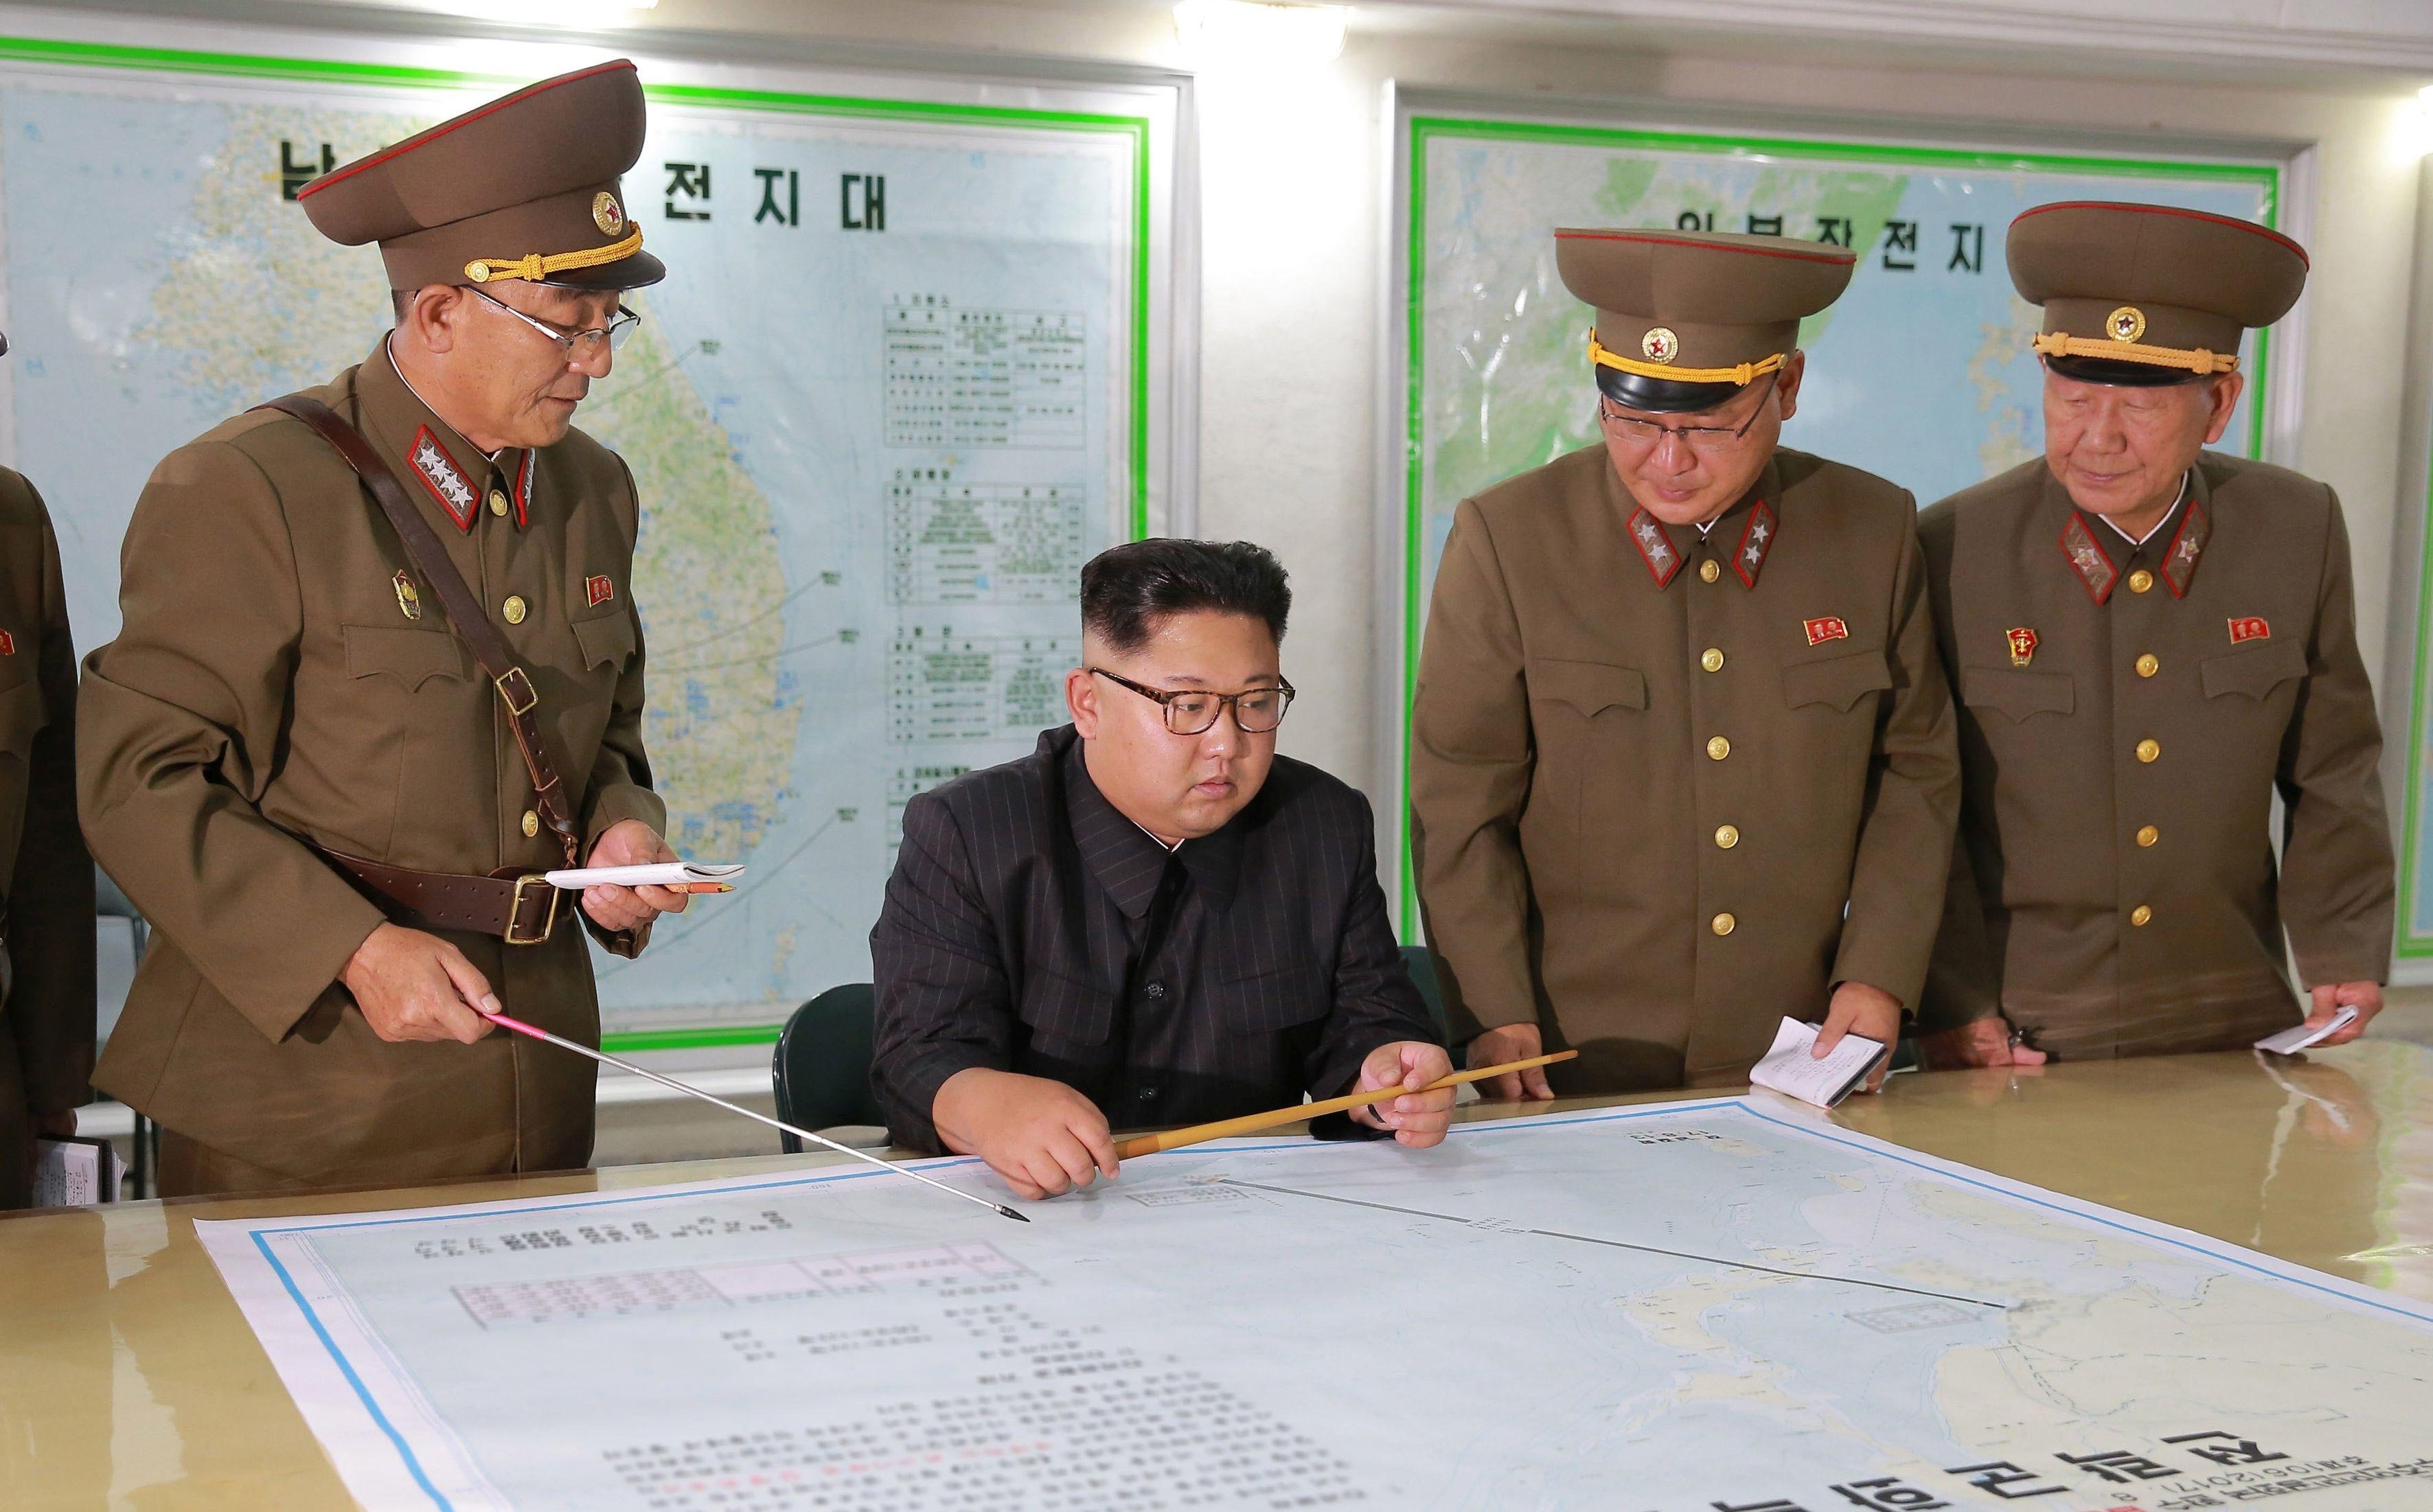 DO NEW YORKA Sjeverna Koreja objavila fotografije plana nove balističke rakete